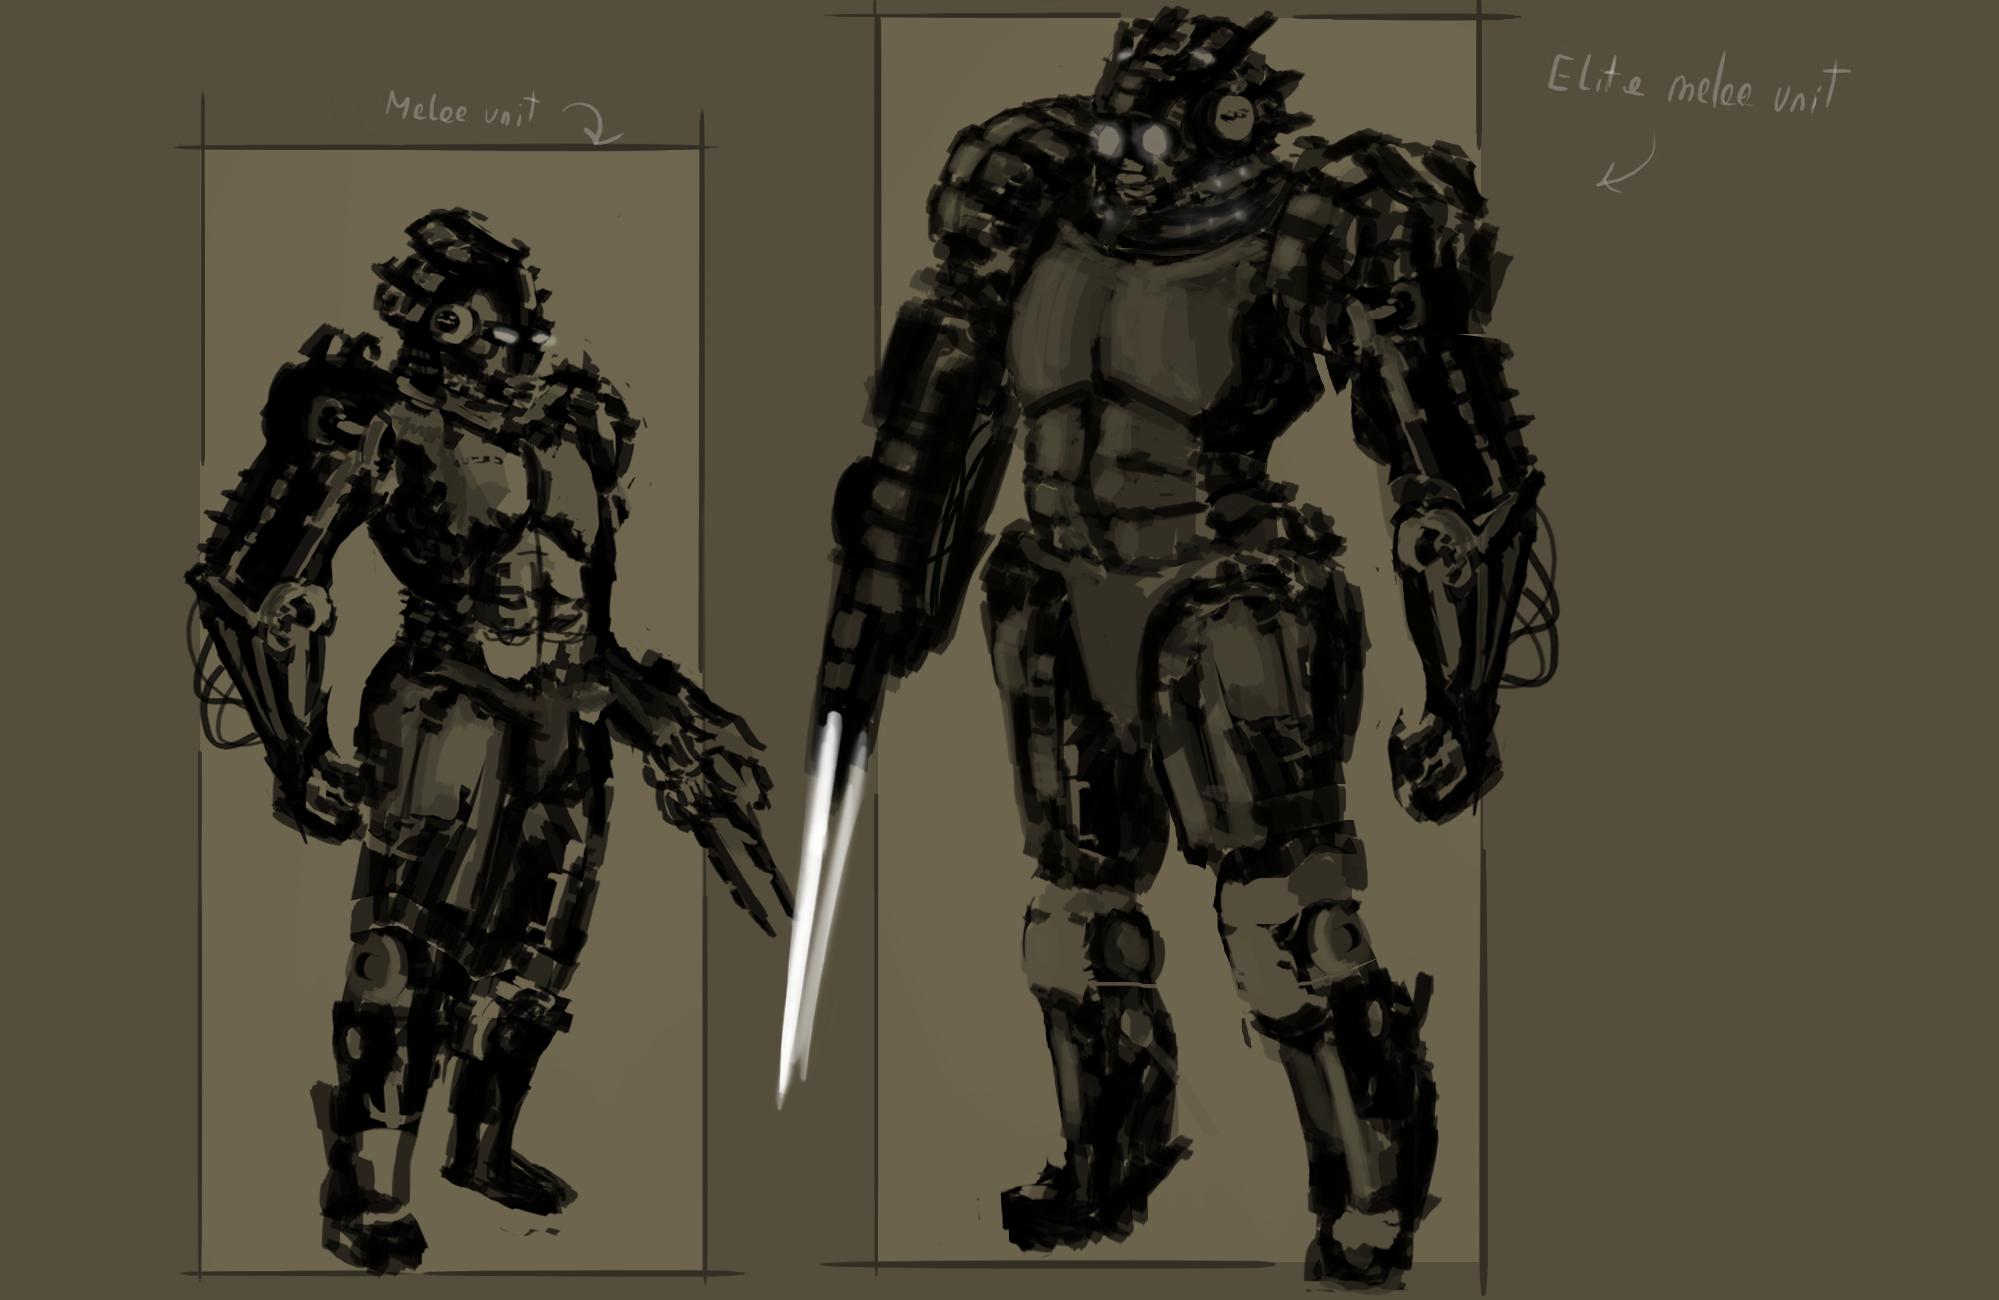 Space soldier design